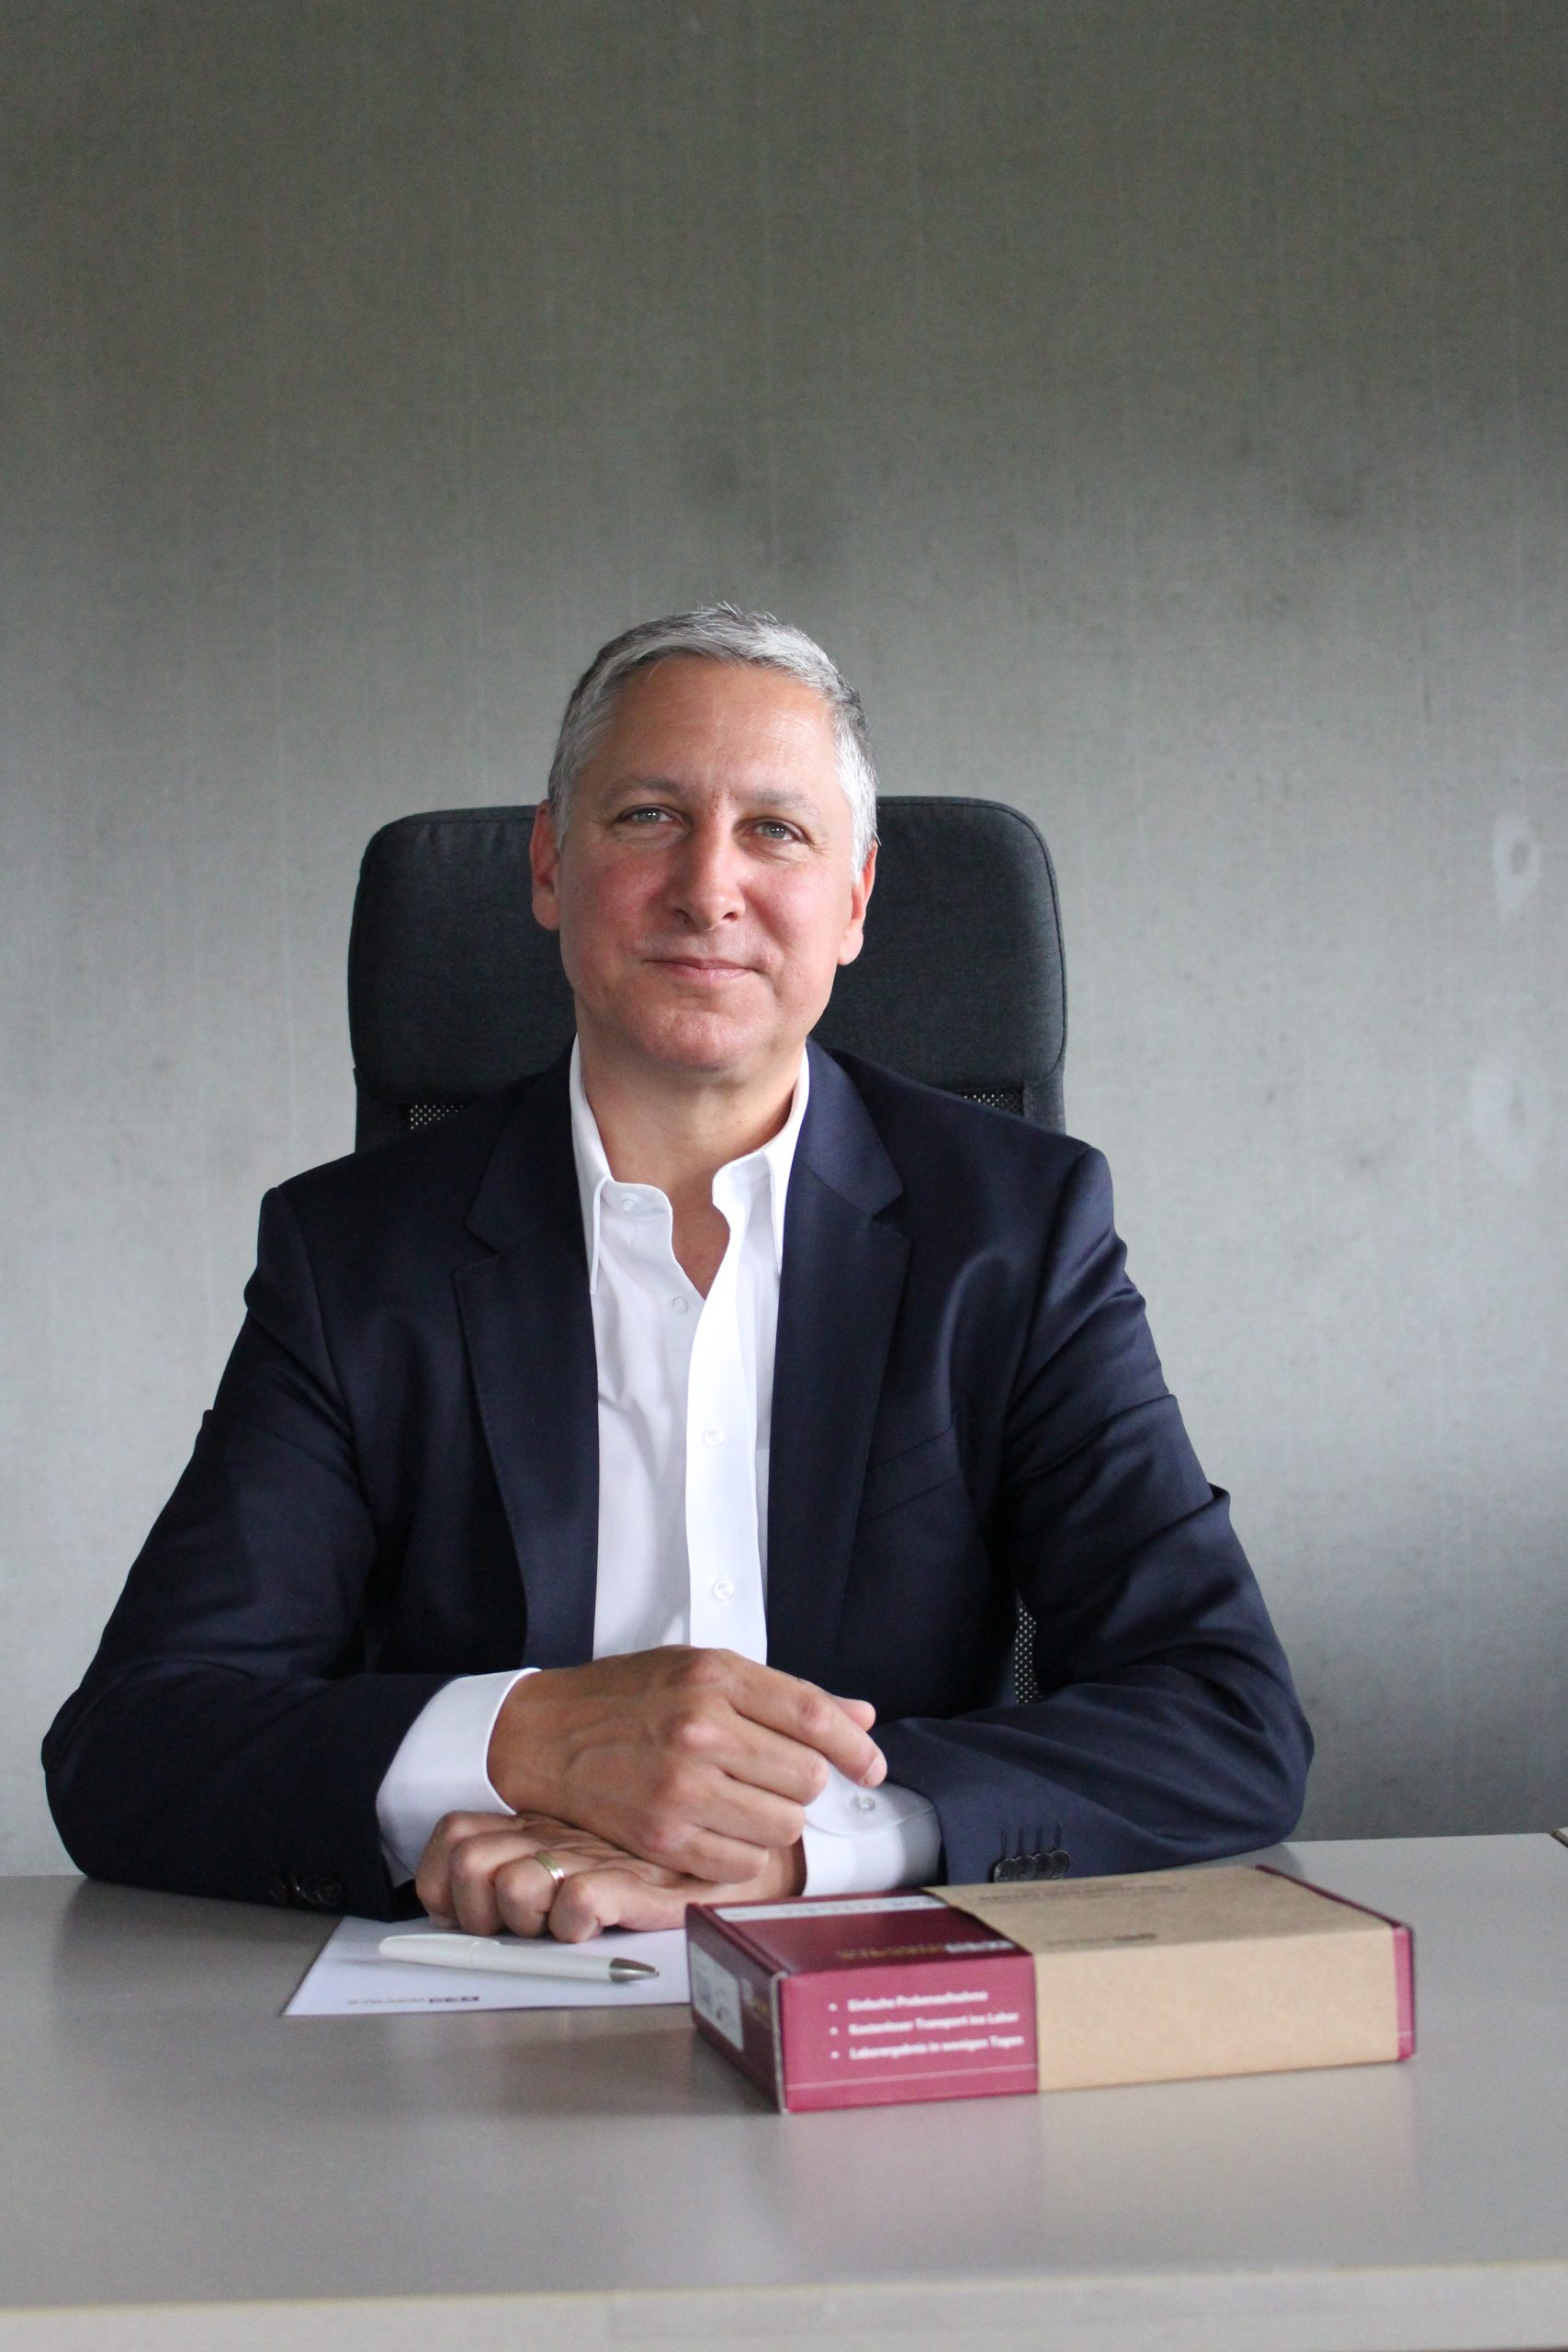 YES we care - Geschäftsführer Thomas Exel